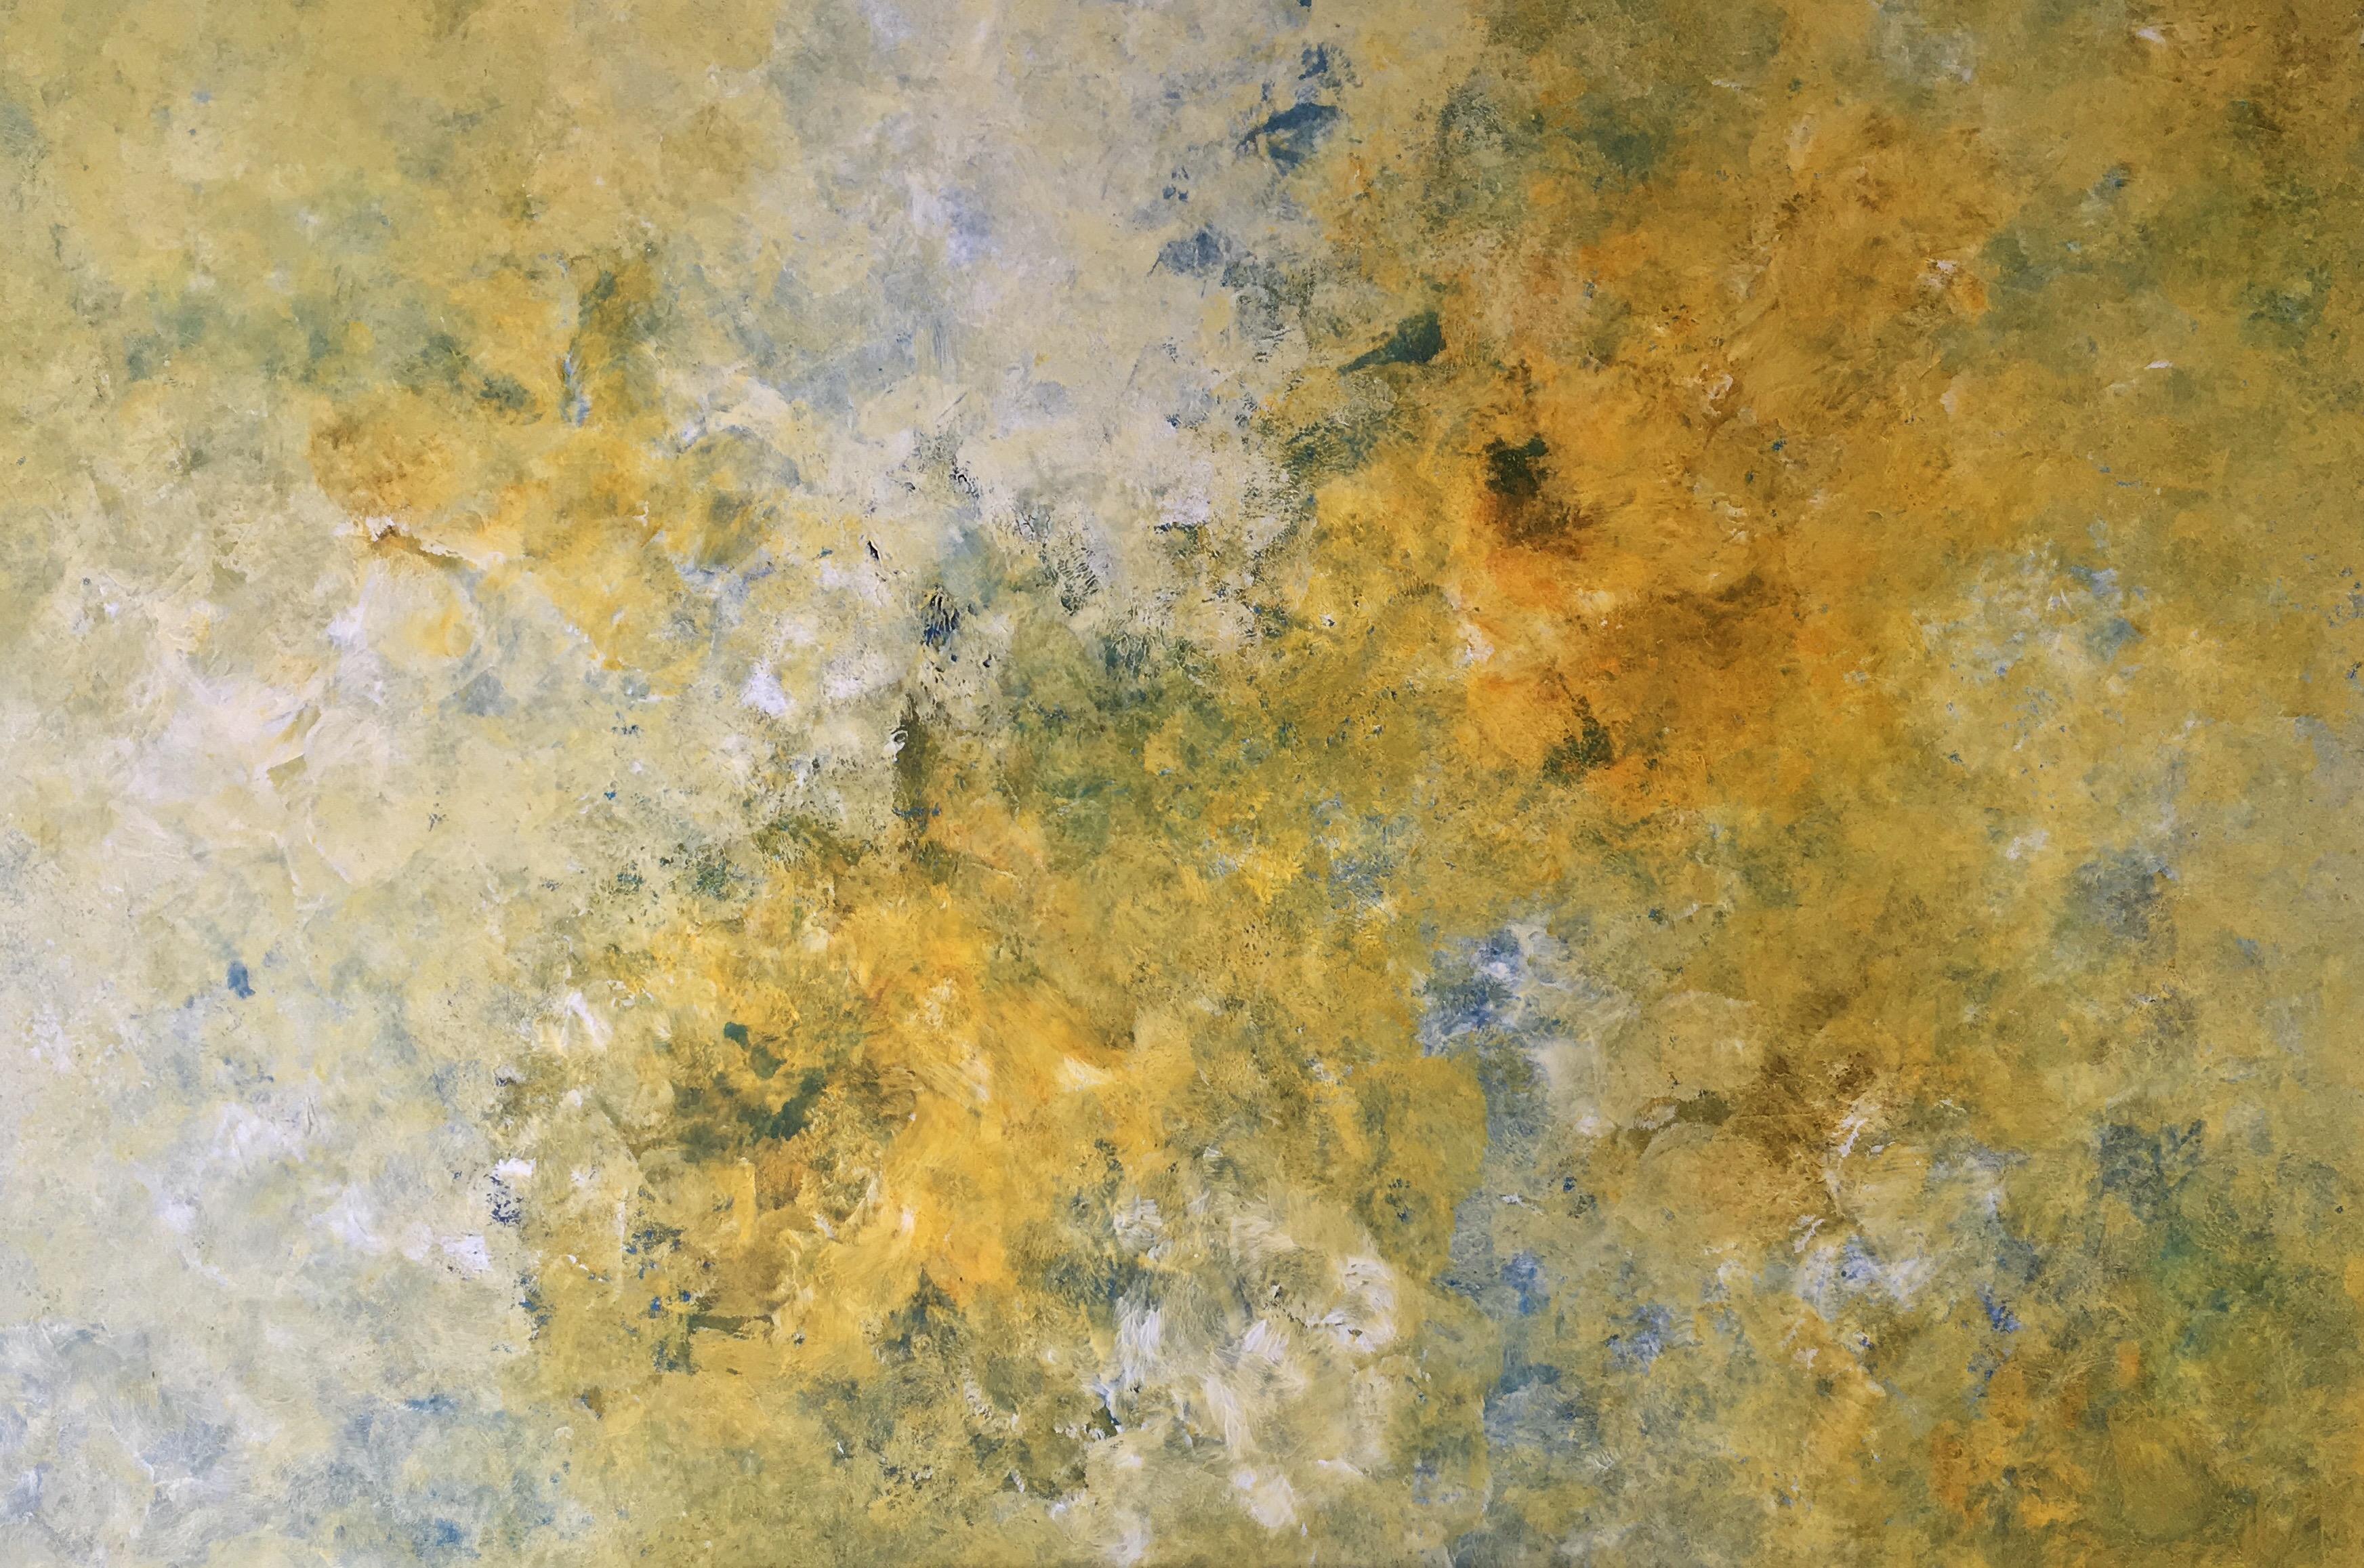 Marine Bonzom - Artiste Peintre Biarritz - Aura